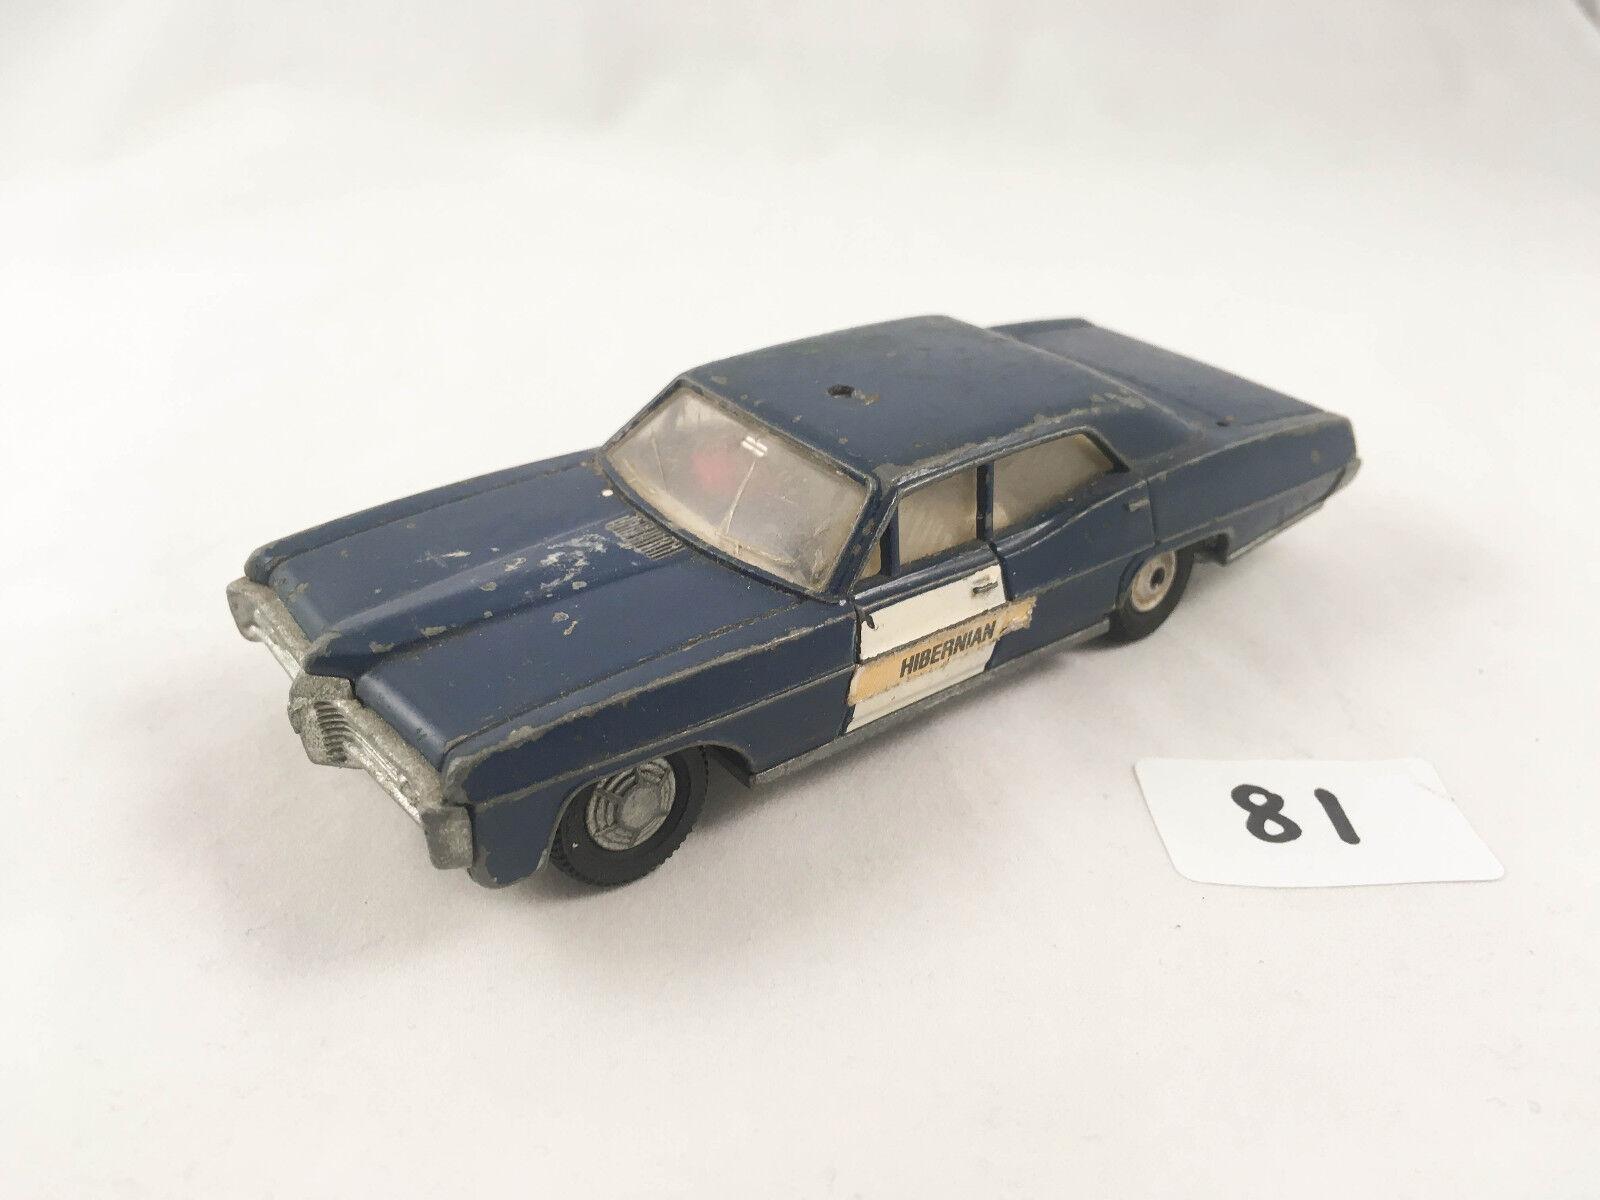 RARE VINTAGE DINKY TOYS PONTIAC PARISIENNE RCMP POLICE CAR DIECAST 1970